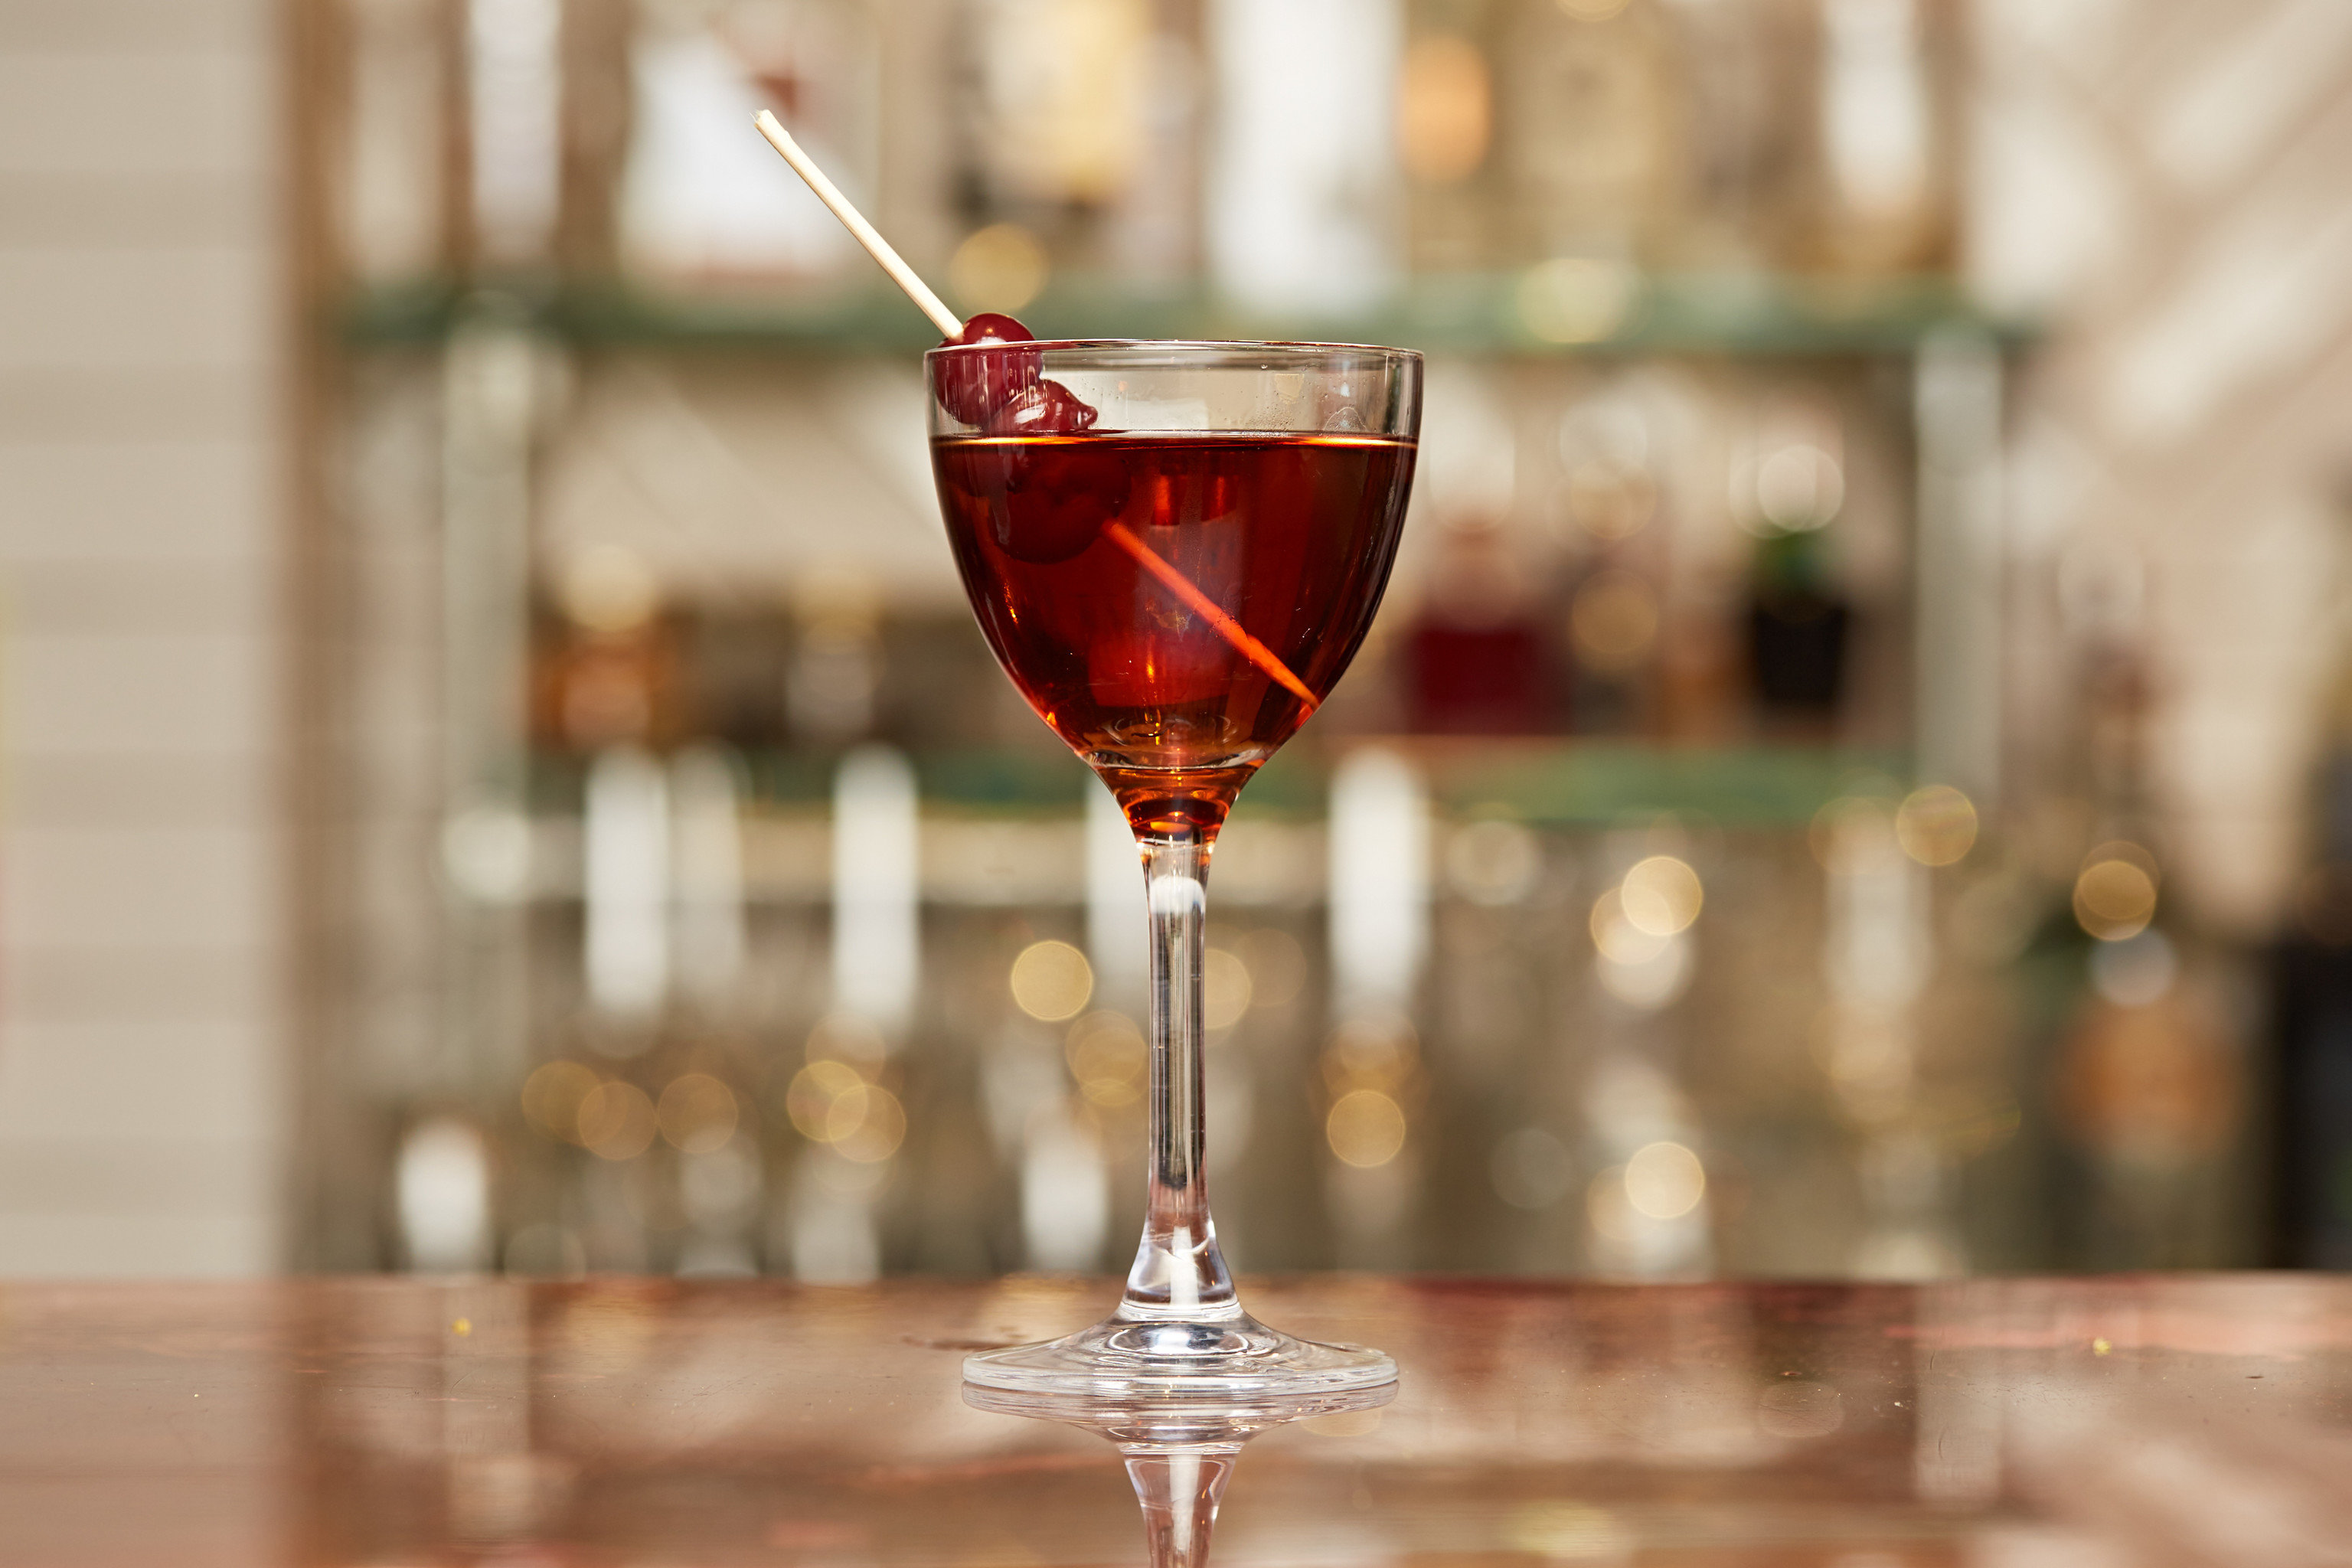 Romance Trip Ideas wine table glass Drink alcoholic beverage glasses cocktail martini wine glass beverage stemware alcohol